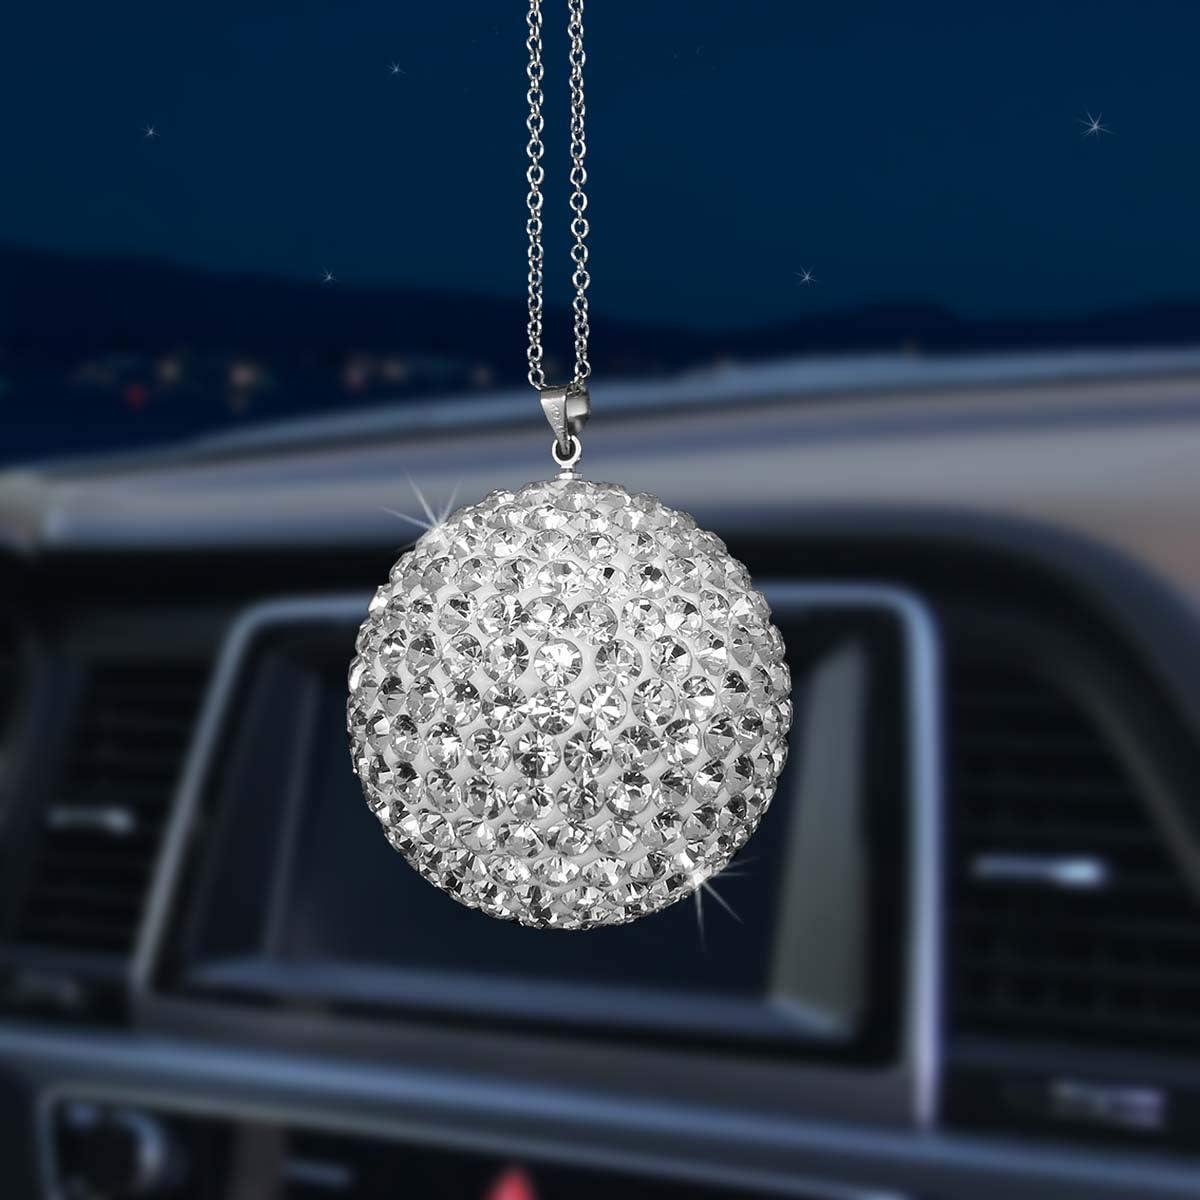 Star Car Pendant Mirror Pendant Inlay Pearl Rhinestone Ornaments Bling Decor Crystal Car Ornament Rear View Mirror Charm with Fur Tail Balls Cute Creative Car Accessories Hanging Decoration